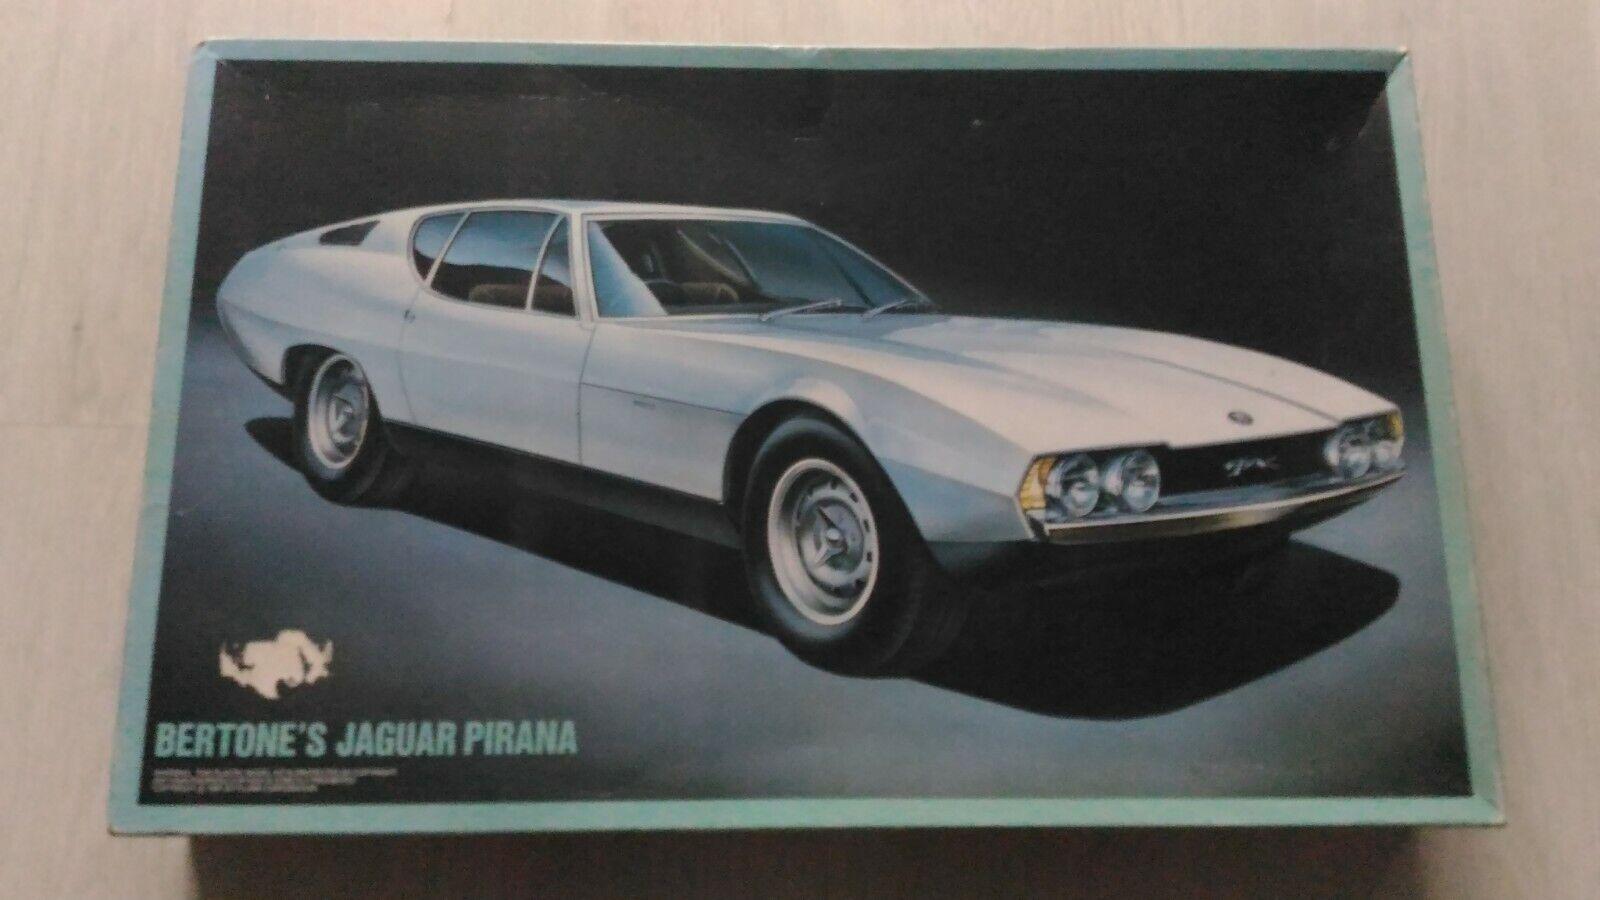 Fujimi 1 16 Scale Bertone s Jaguar Pirana Model Kit RARE